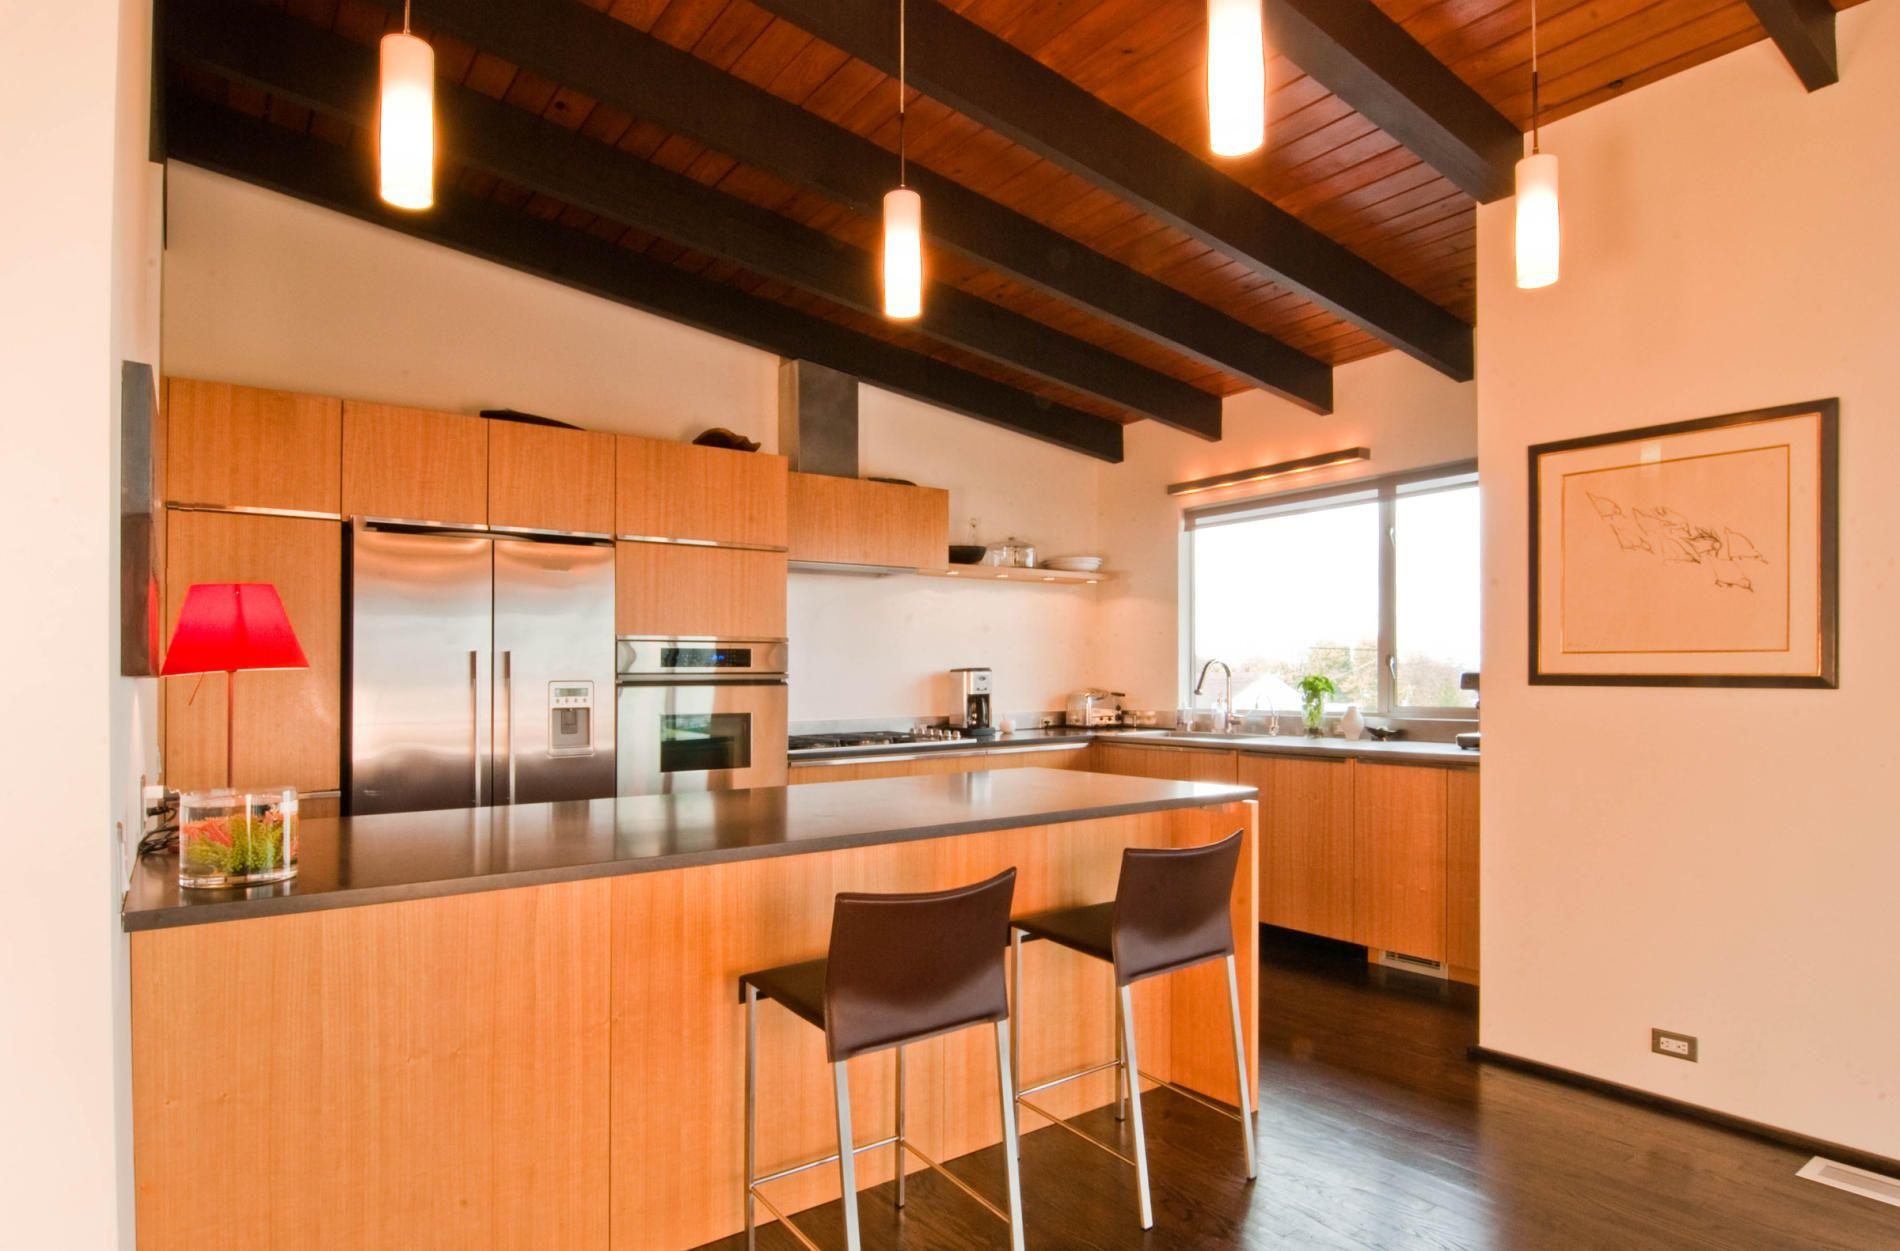 Remodeled Mid Century Modern Home By Build LLC Kitchen via Design